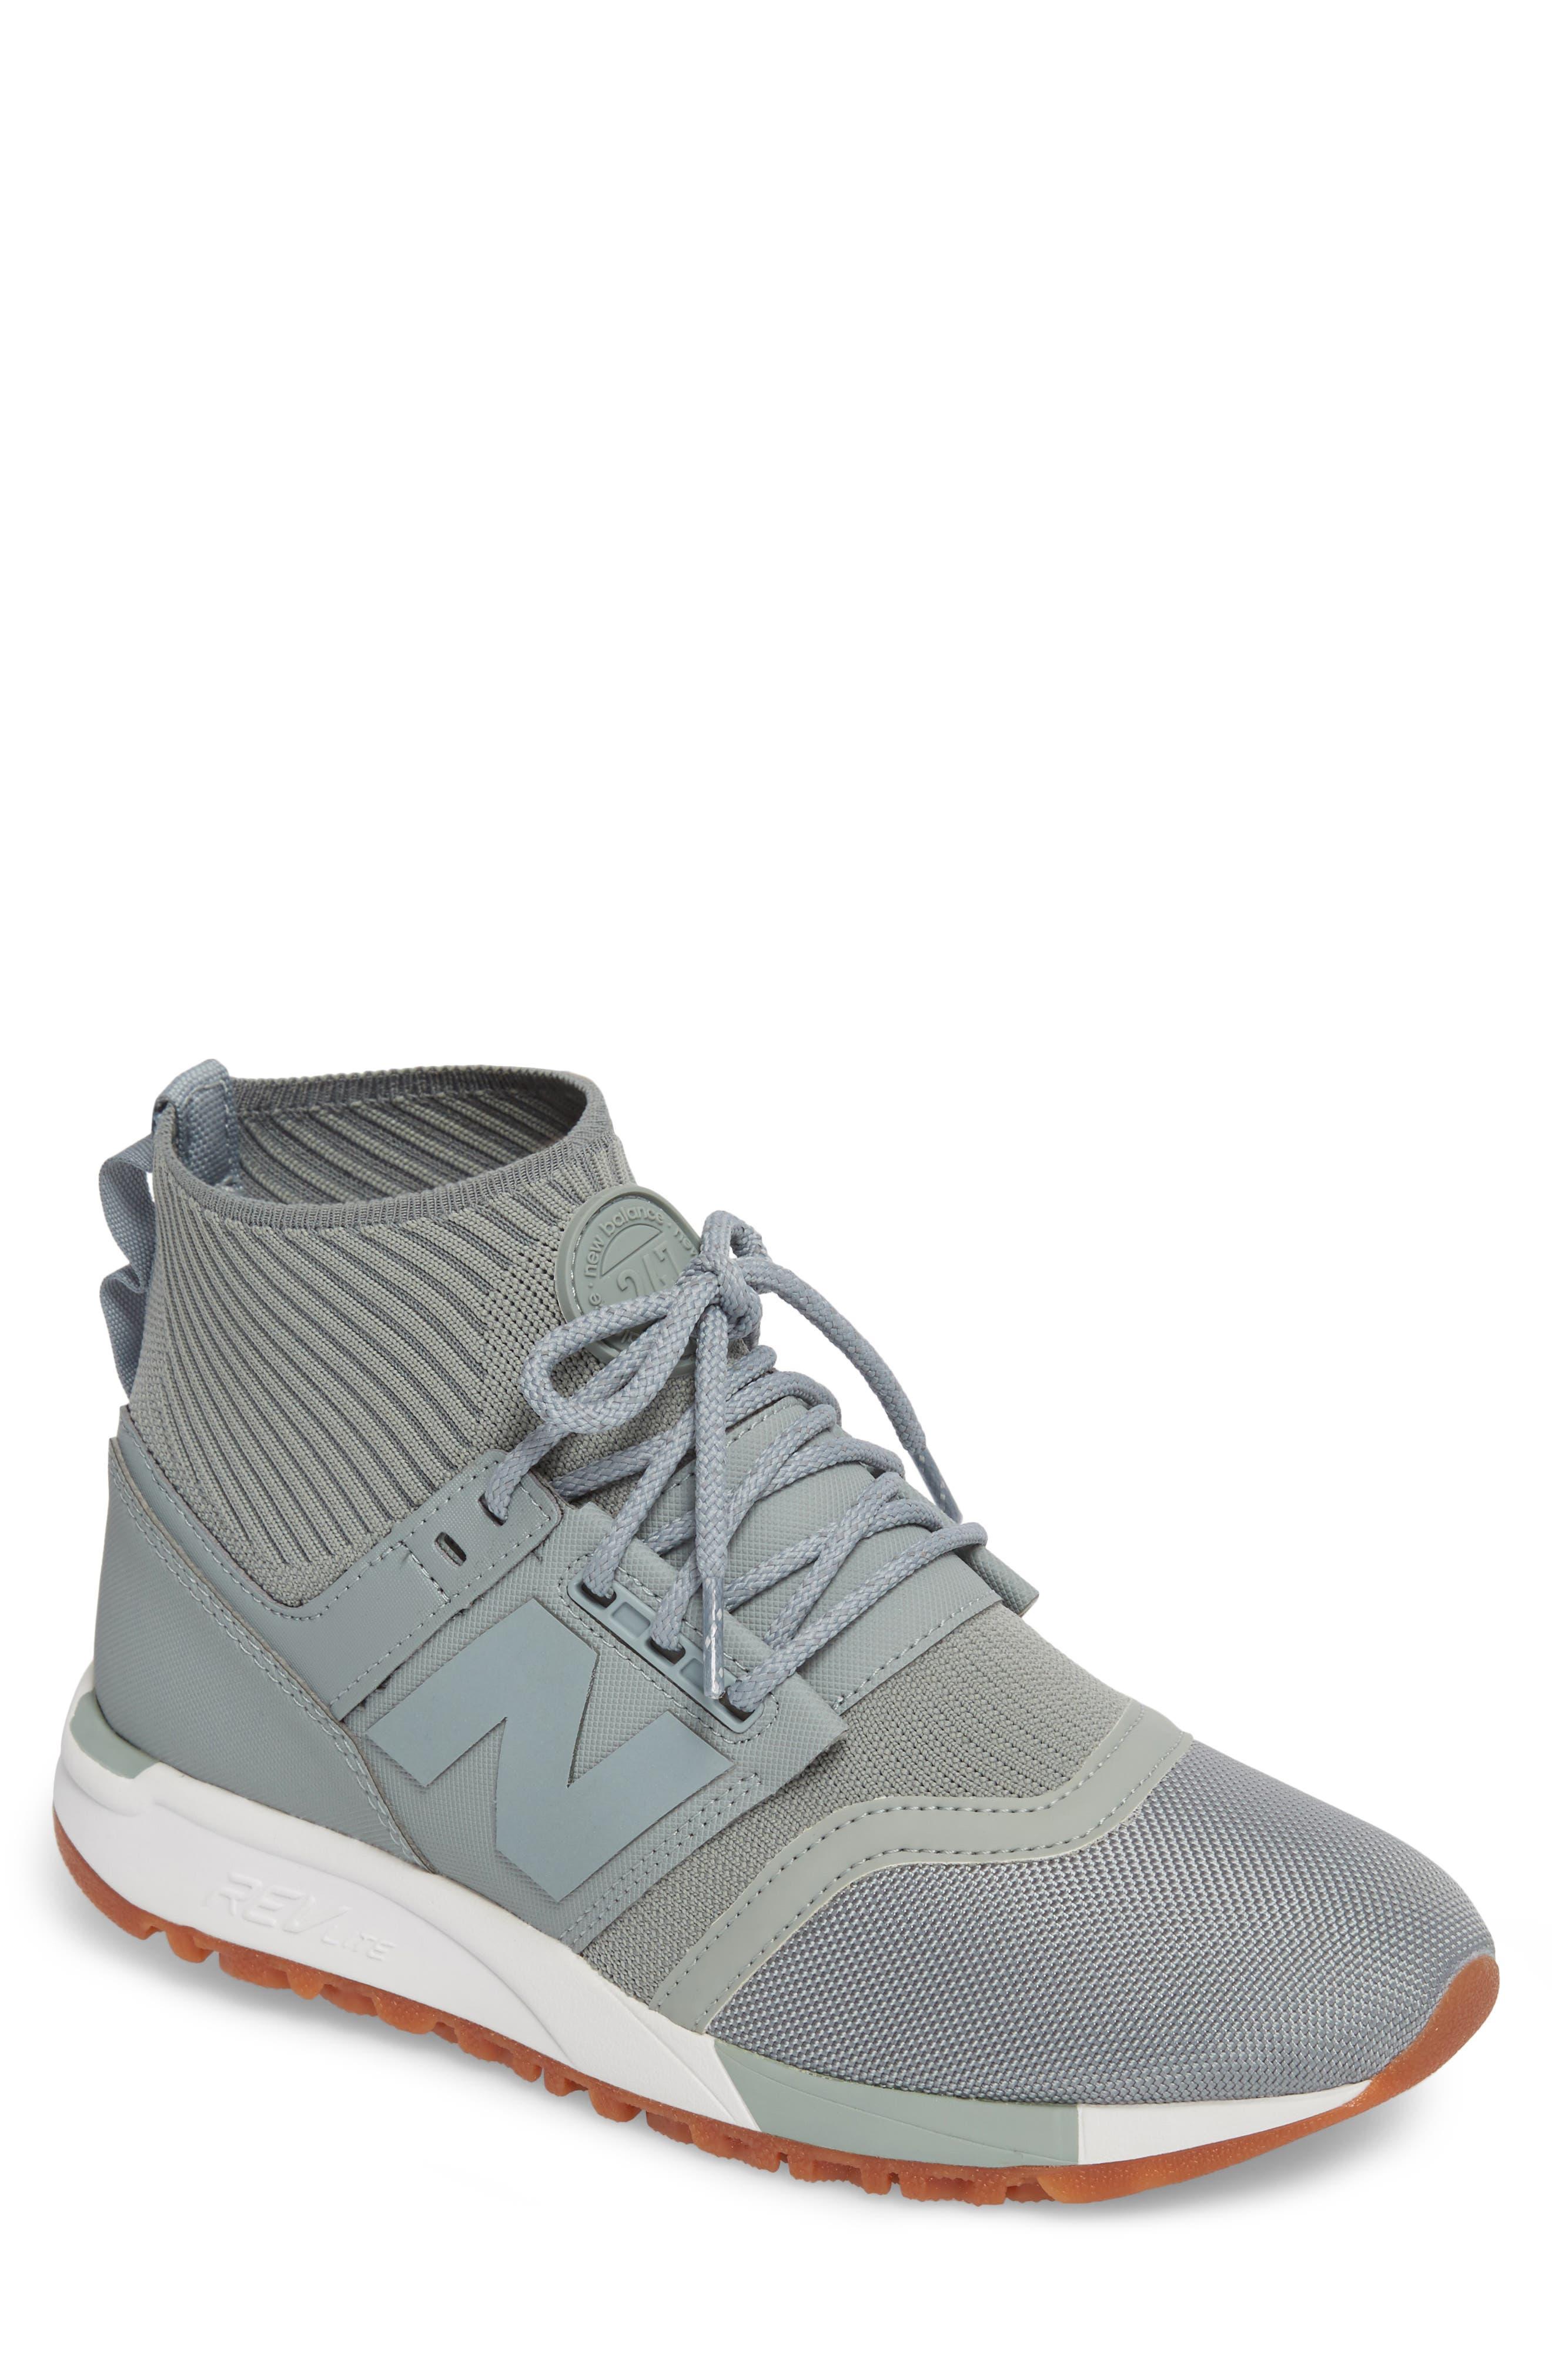 247 Mid Sneaker,                             Main thumbnail 2, color,